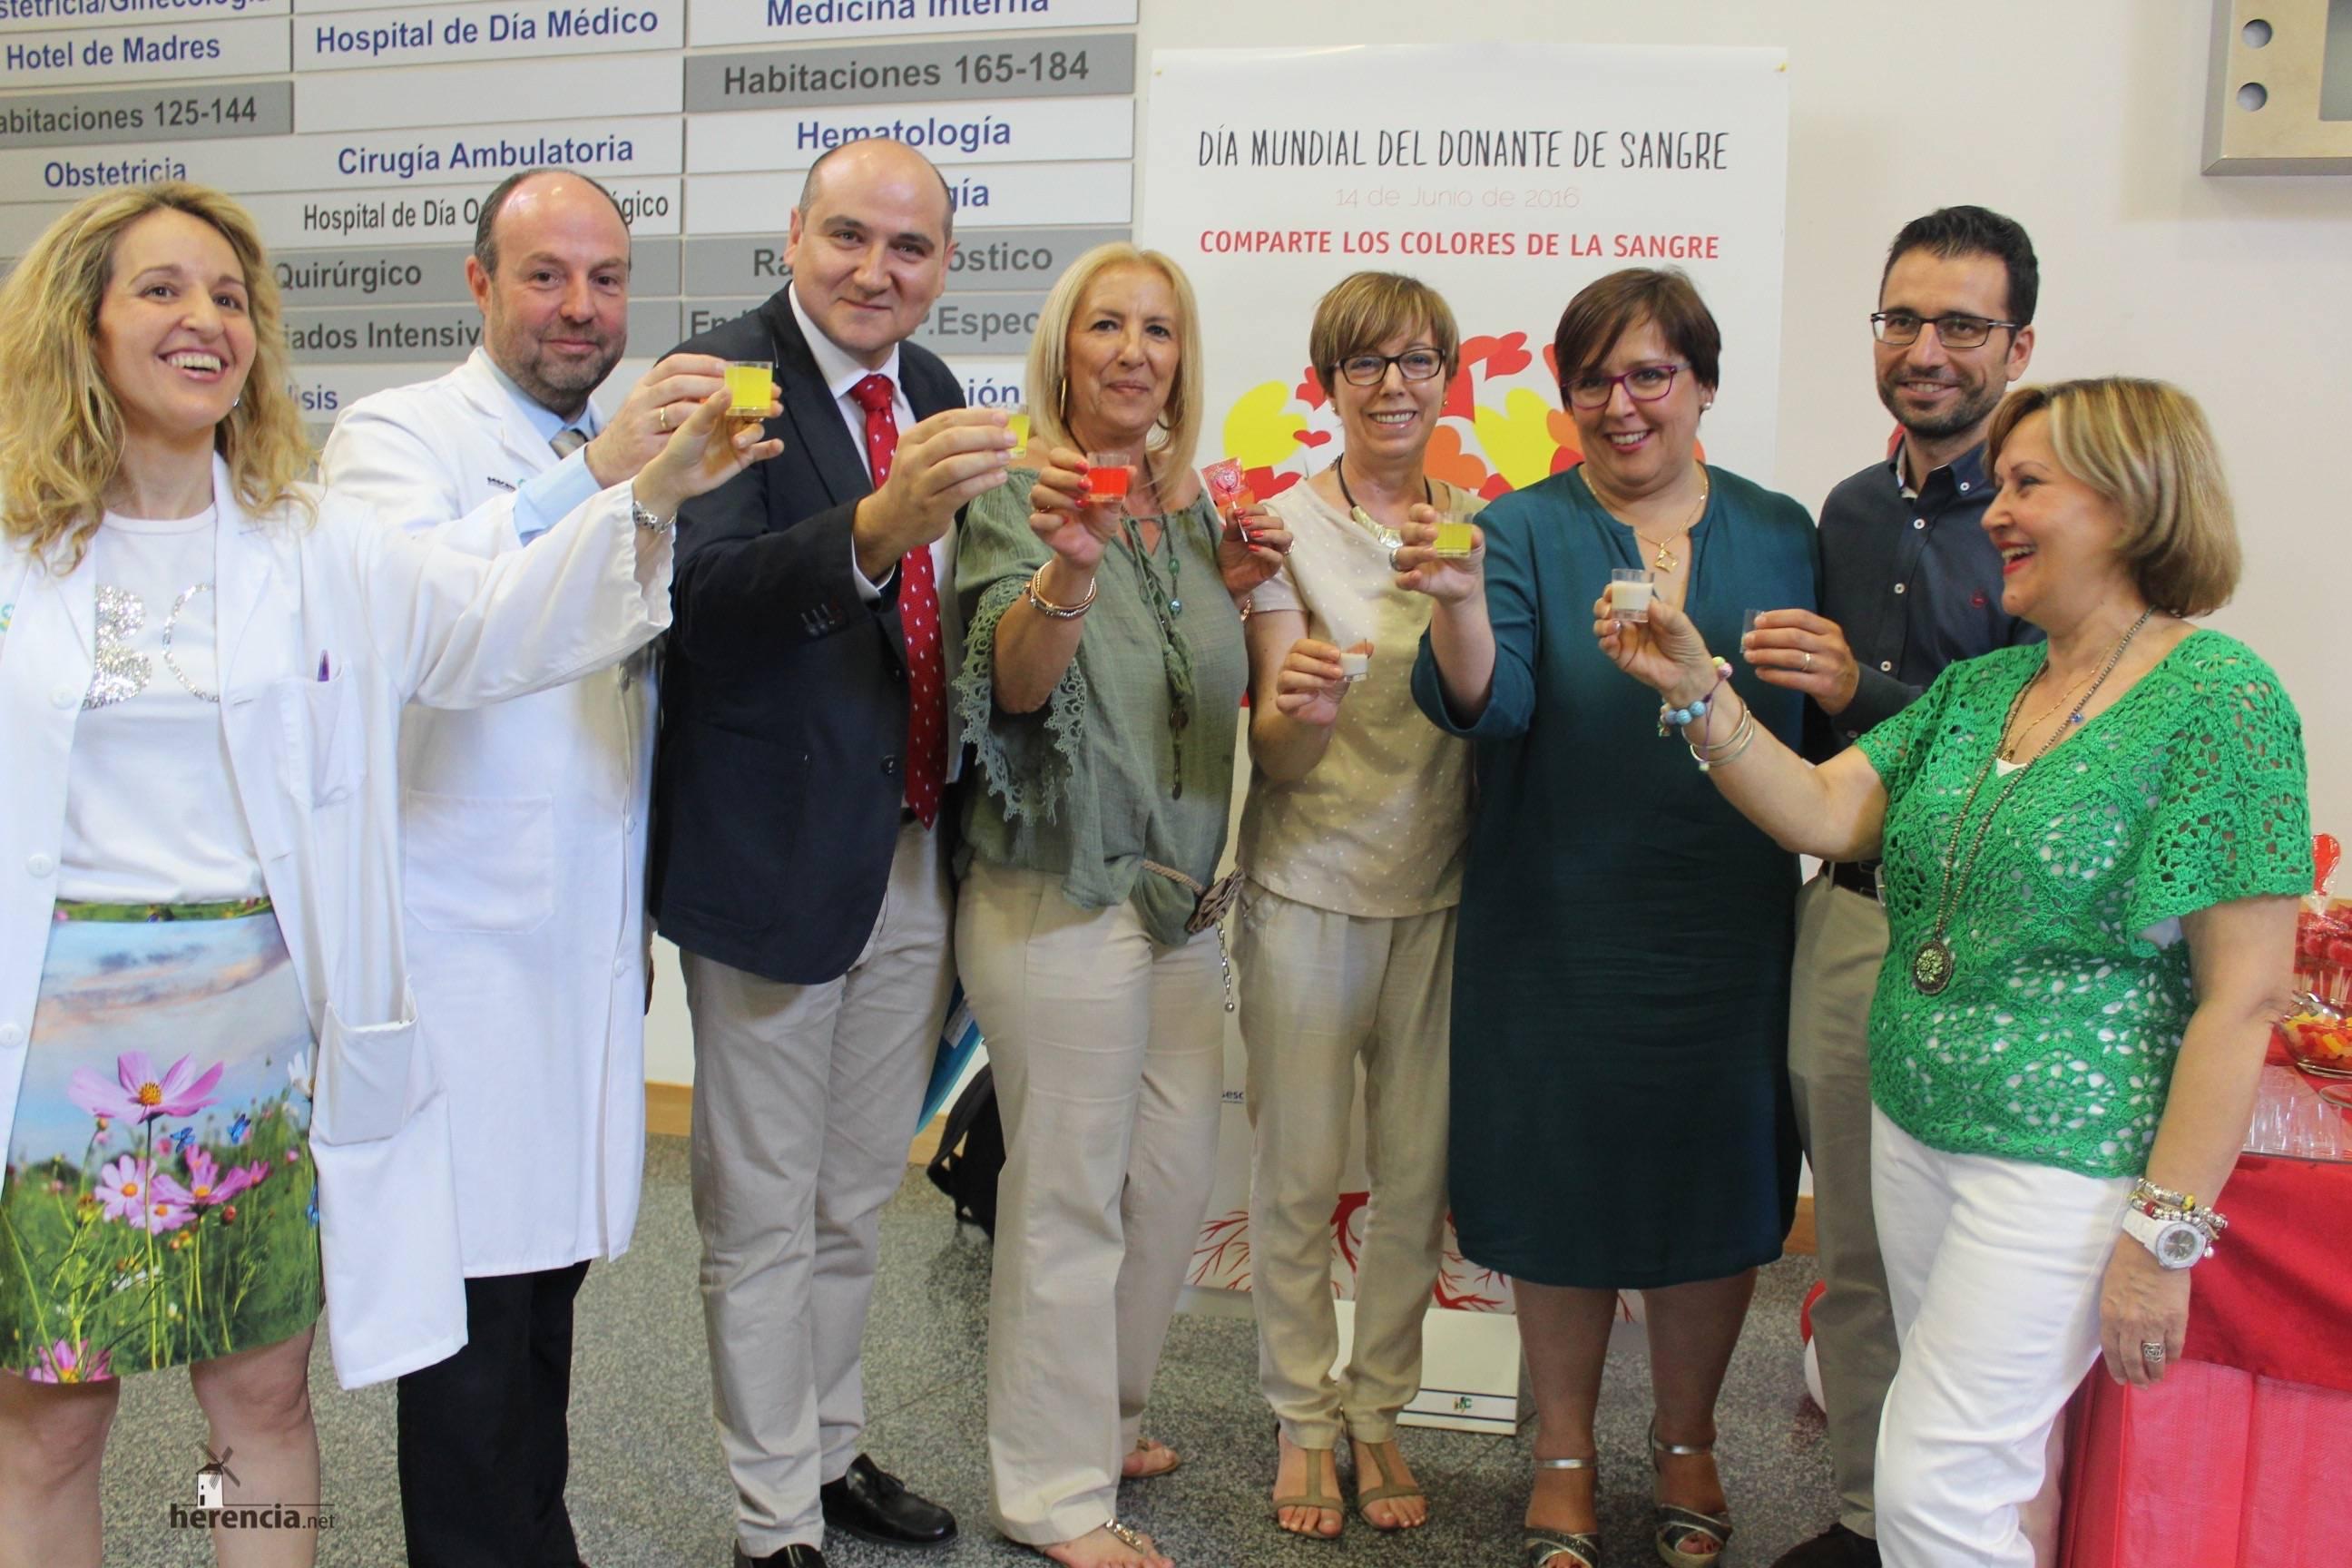 Carmen Olmedo - Dia Mundial Donante Sangre